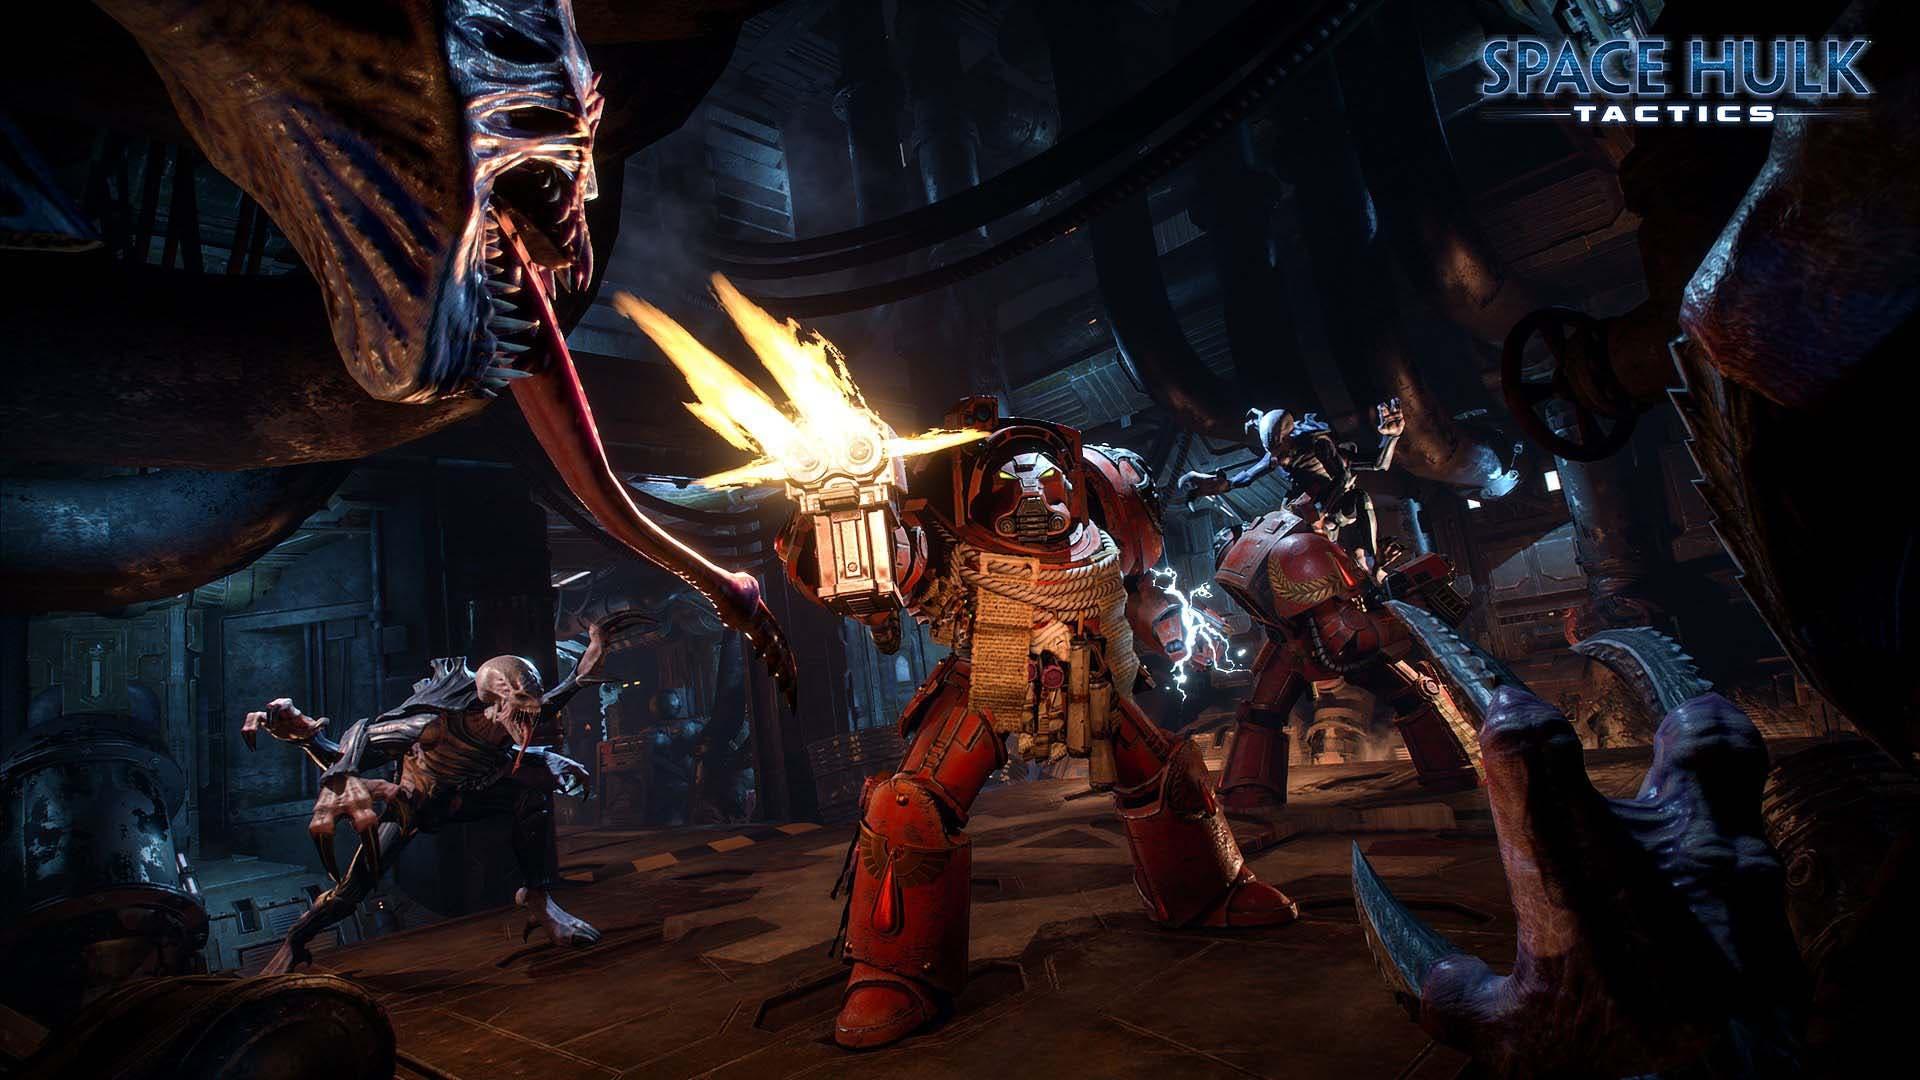 Se presenta Space Hulk:Tactics, estrategia ambientada en Warhammer 40k 2